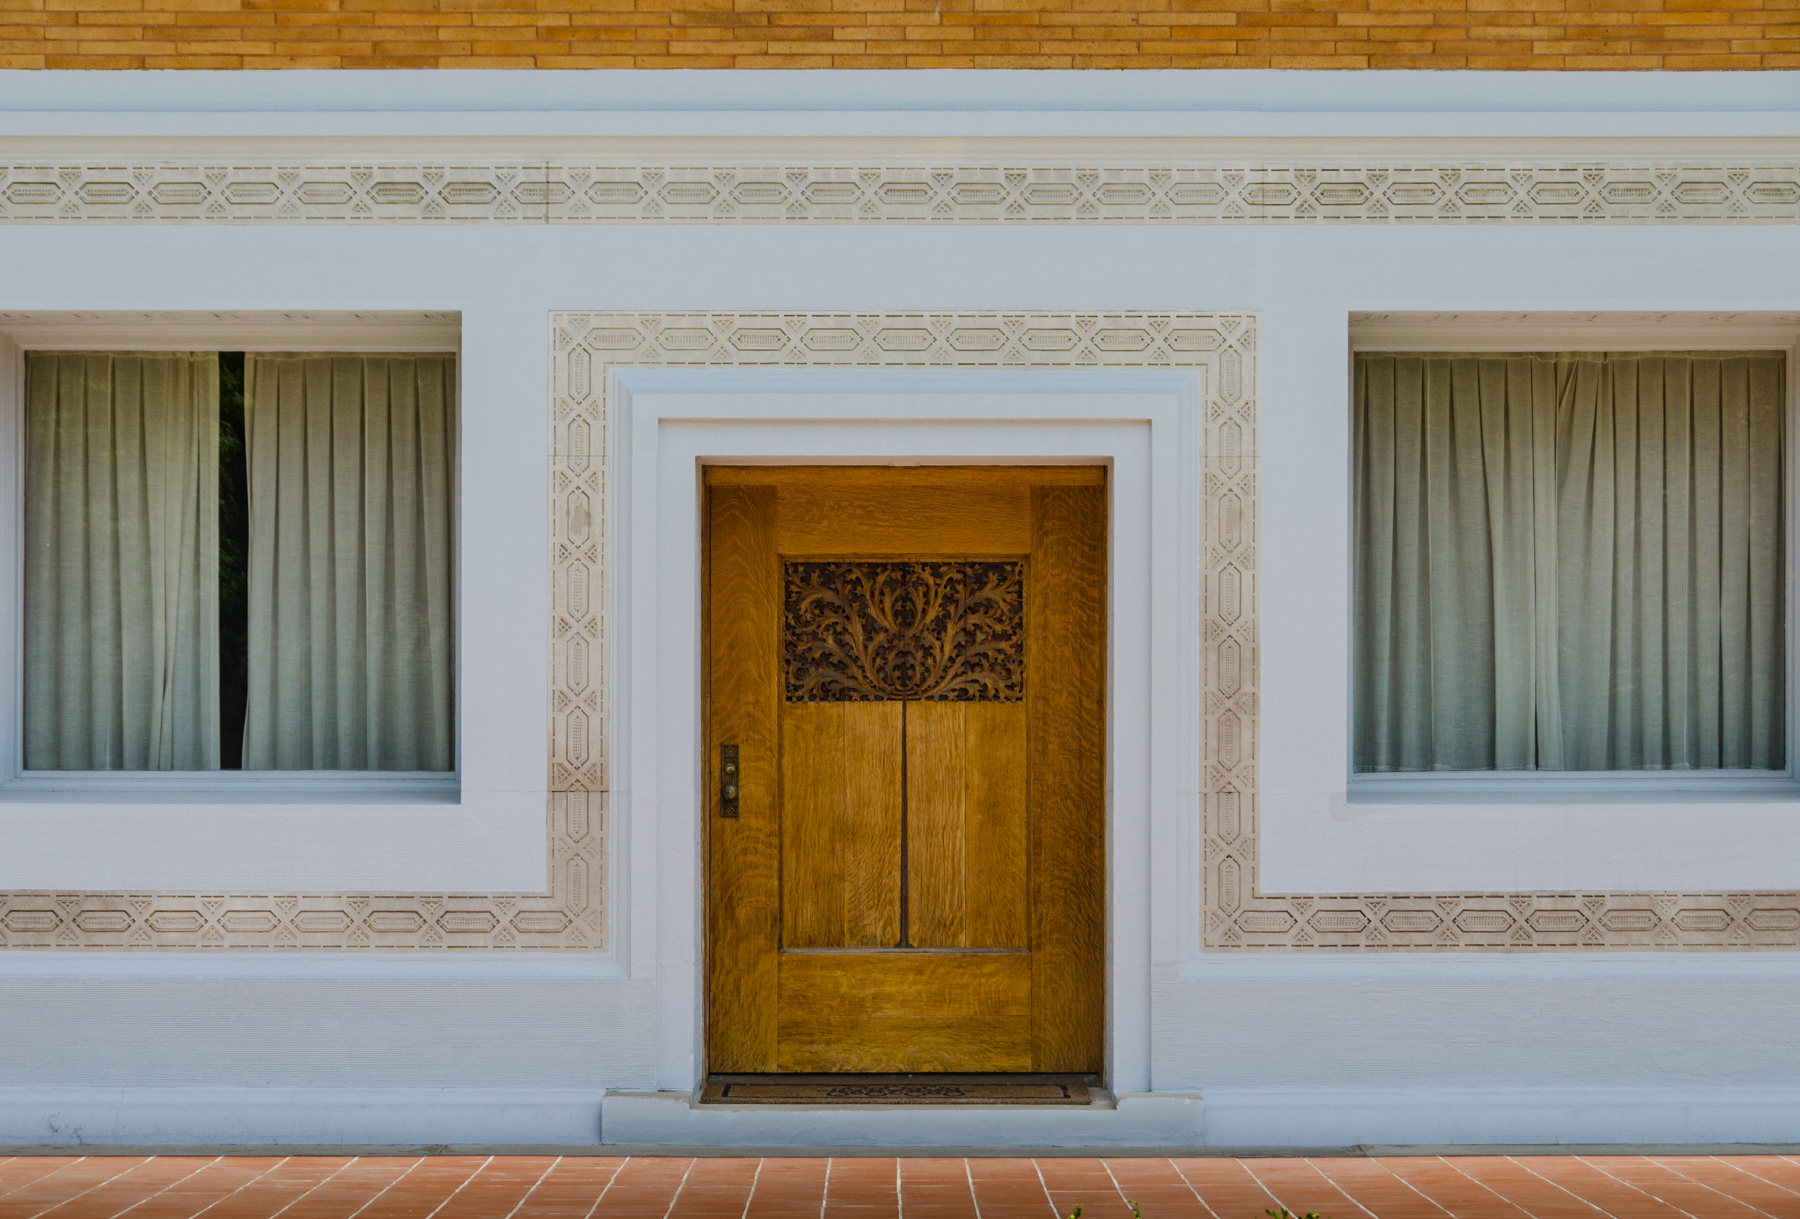 How Louis Sullivan S Organic Architecture Inspired Frank